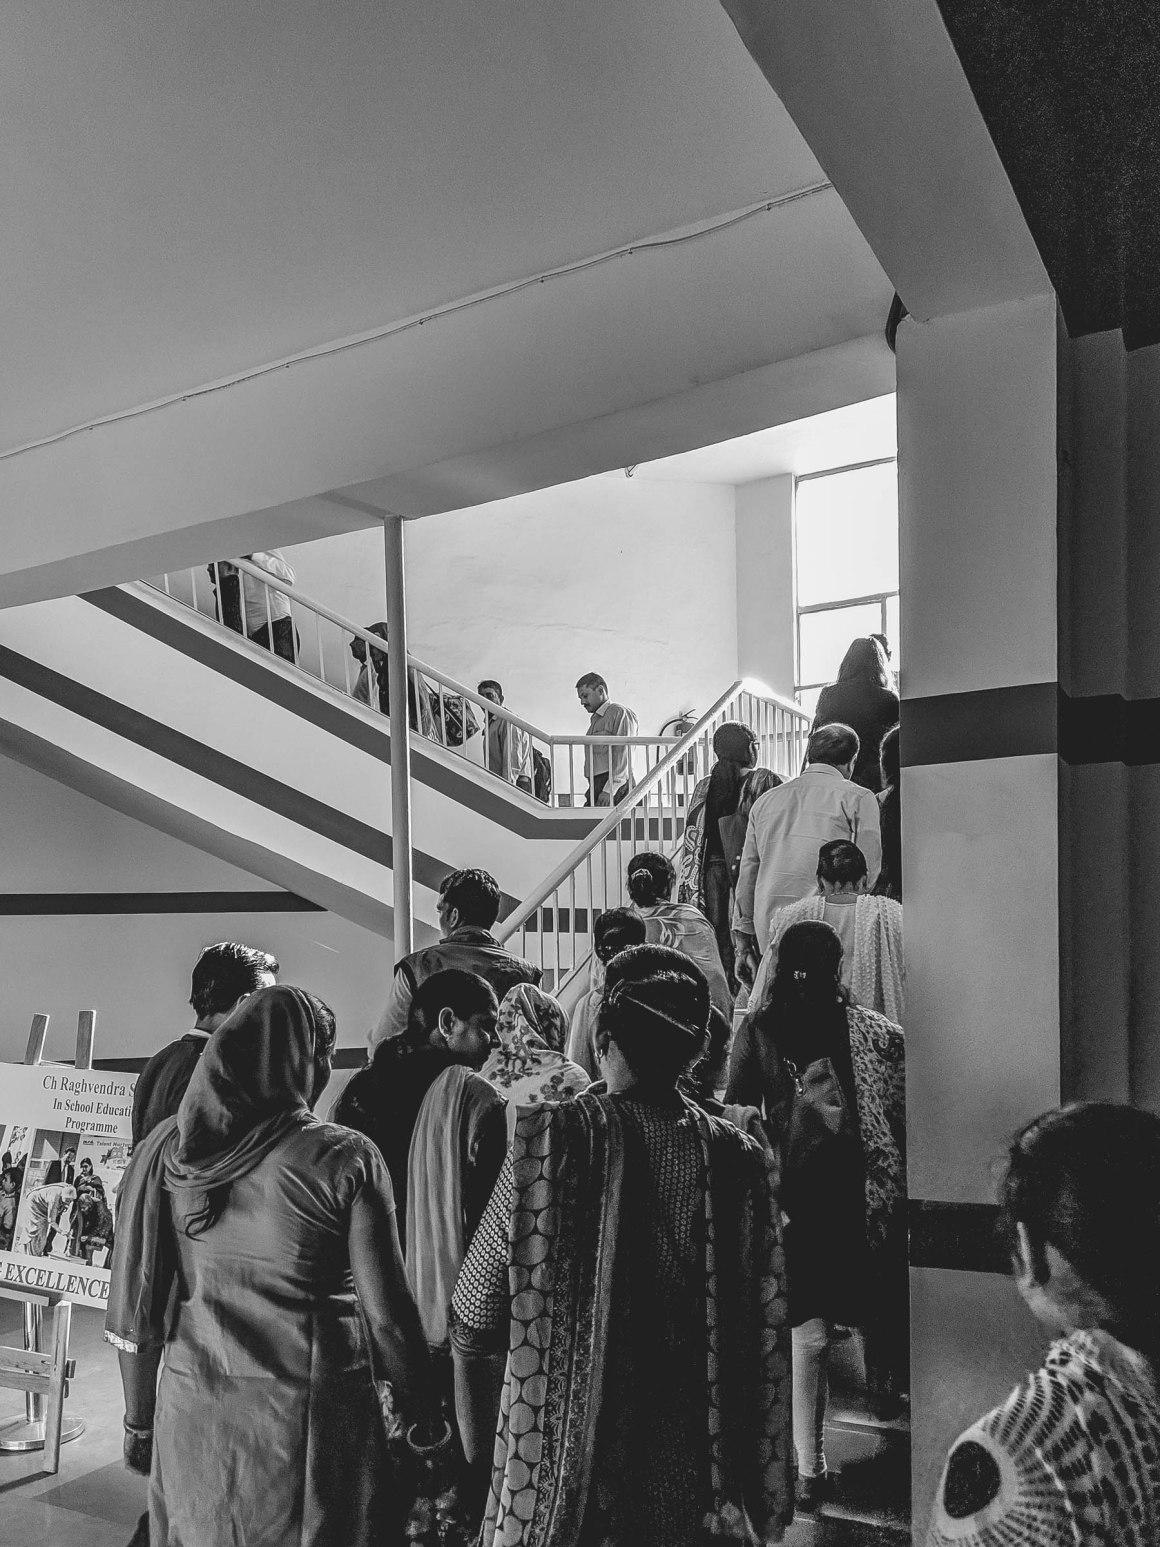 #TheNainaRedhuExperience, 2018, Brand Consultant, Career Option, Ch Raghavendra Singh, Ch Raghvendra Singh, DLF Foundation, DLF Foundation Workshop, DLF Nurturing Excellence Programme, event, Gurgaon, Gurugram, In School Education Programme, India, Indian Market, influencer, instagram, Kids Workshop, lifestyle blogging, Meenakshi Hooda, naina redhu, naina.co, Nurturing Excellence Programme, photographer, photography, Photography As A Career, Photography As a Viable Career, Photography Career, Photography Workshop Gurgaon, Photography Workshop India, school children, school workshop, The Naina Redhu Experience, TNRE, workshop, workshop for children, Workshop for kids, workshops by naina, workshopsbynaina